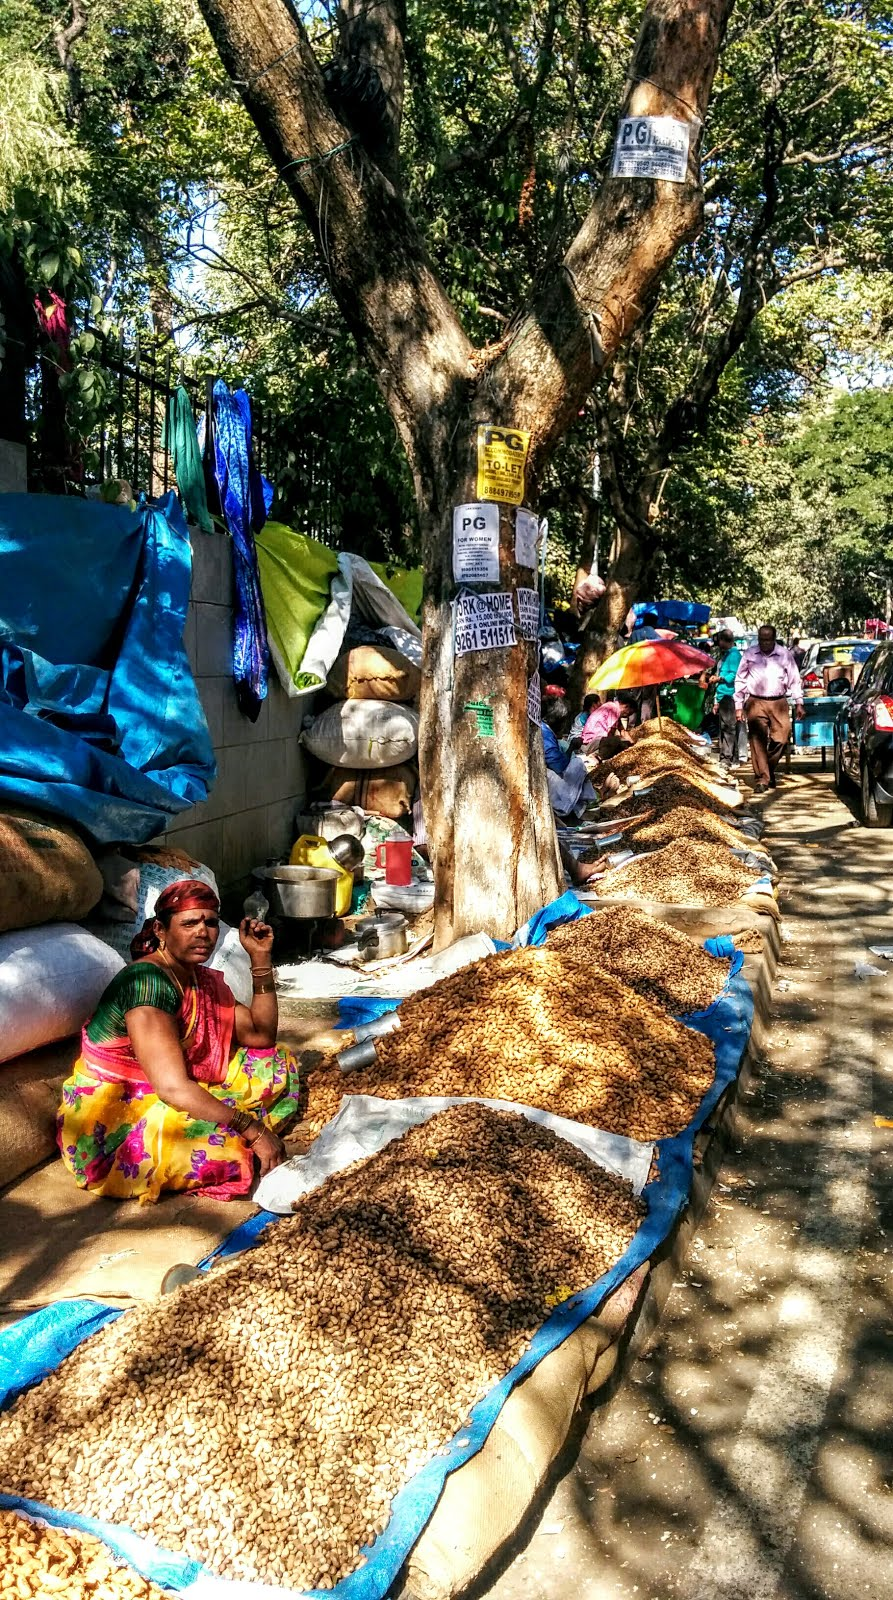 Lane of Groundnut shops on the side lanes of Bull Temple Road at Kadalekai Parishe